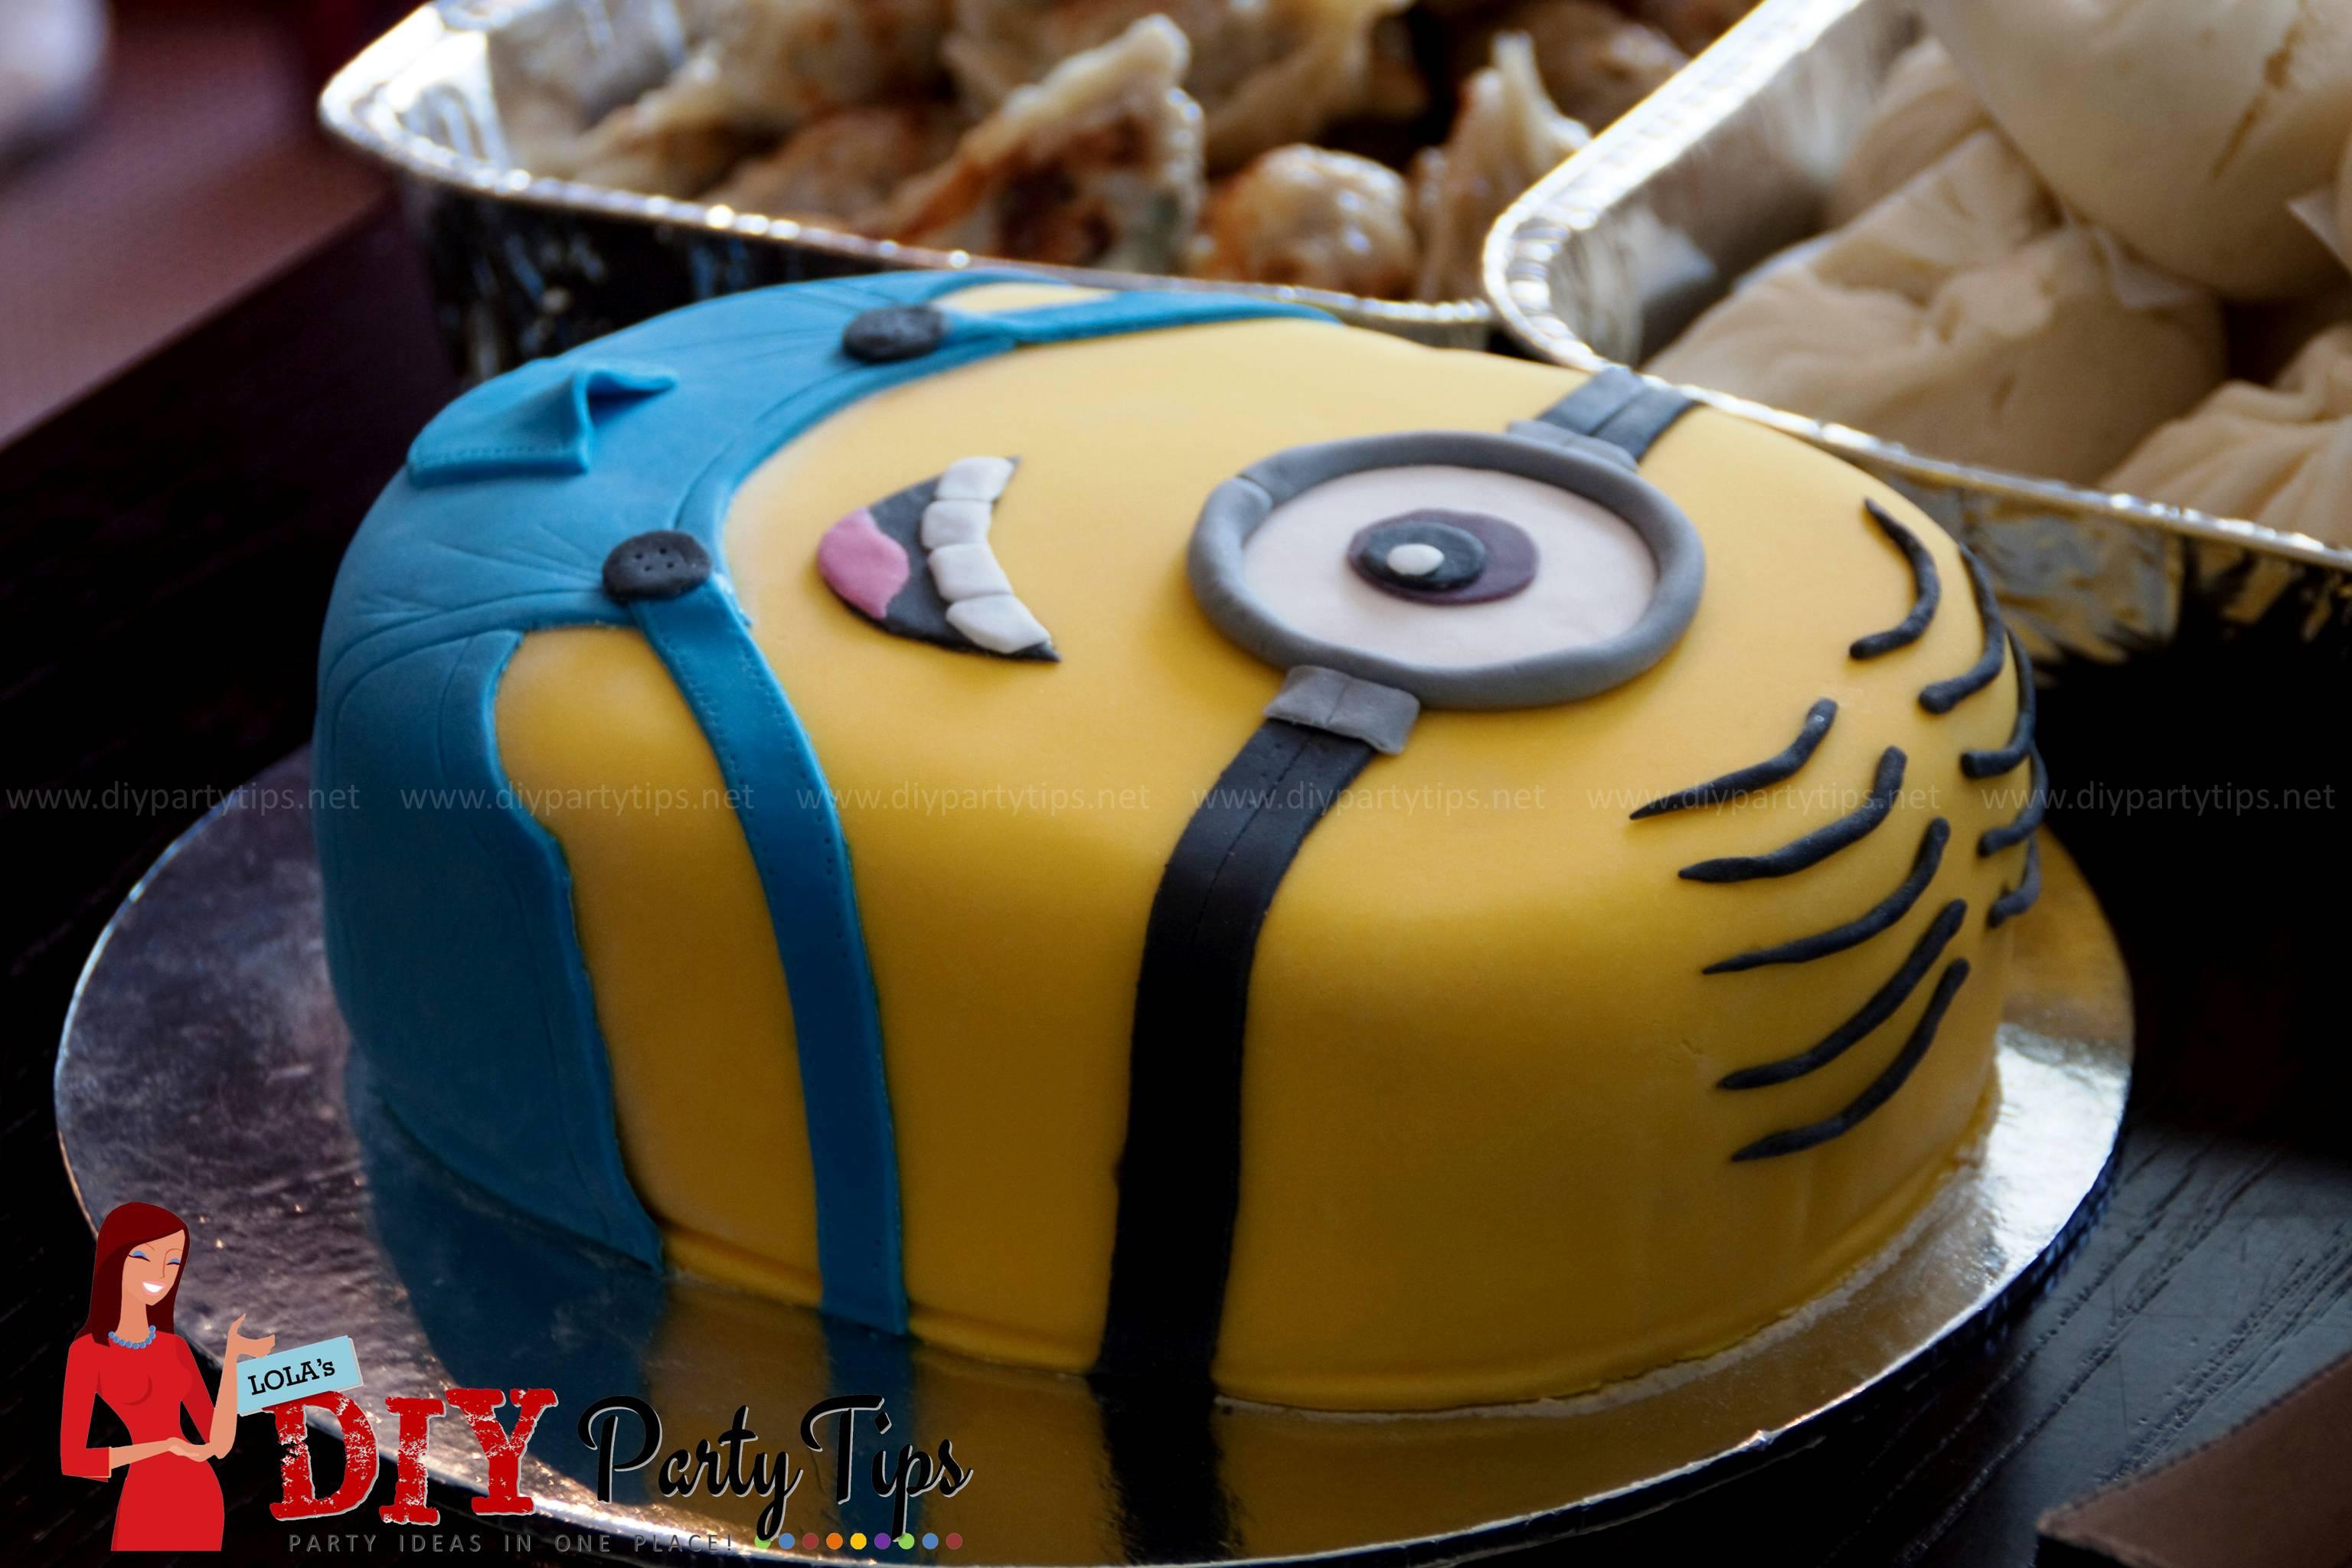 Lola S Diy Party Tips Deable Me Minion Cake